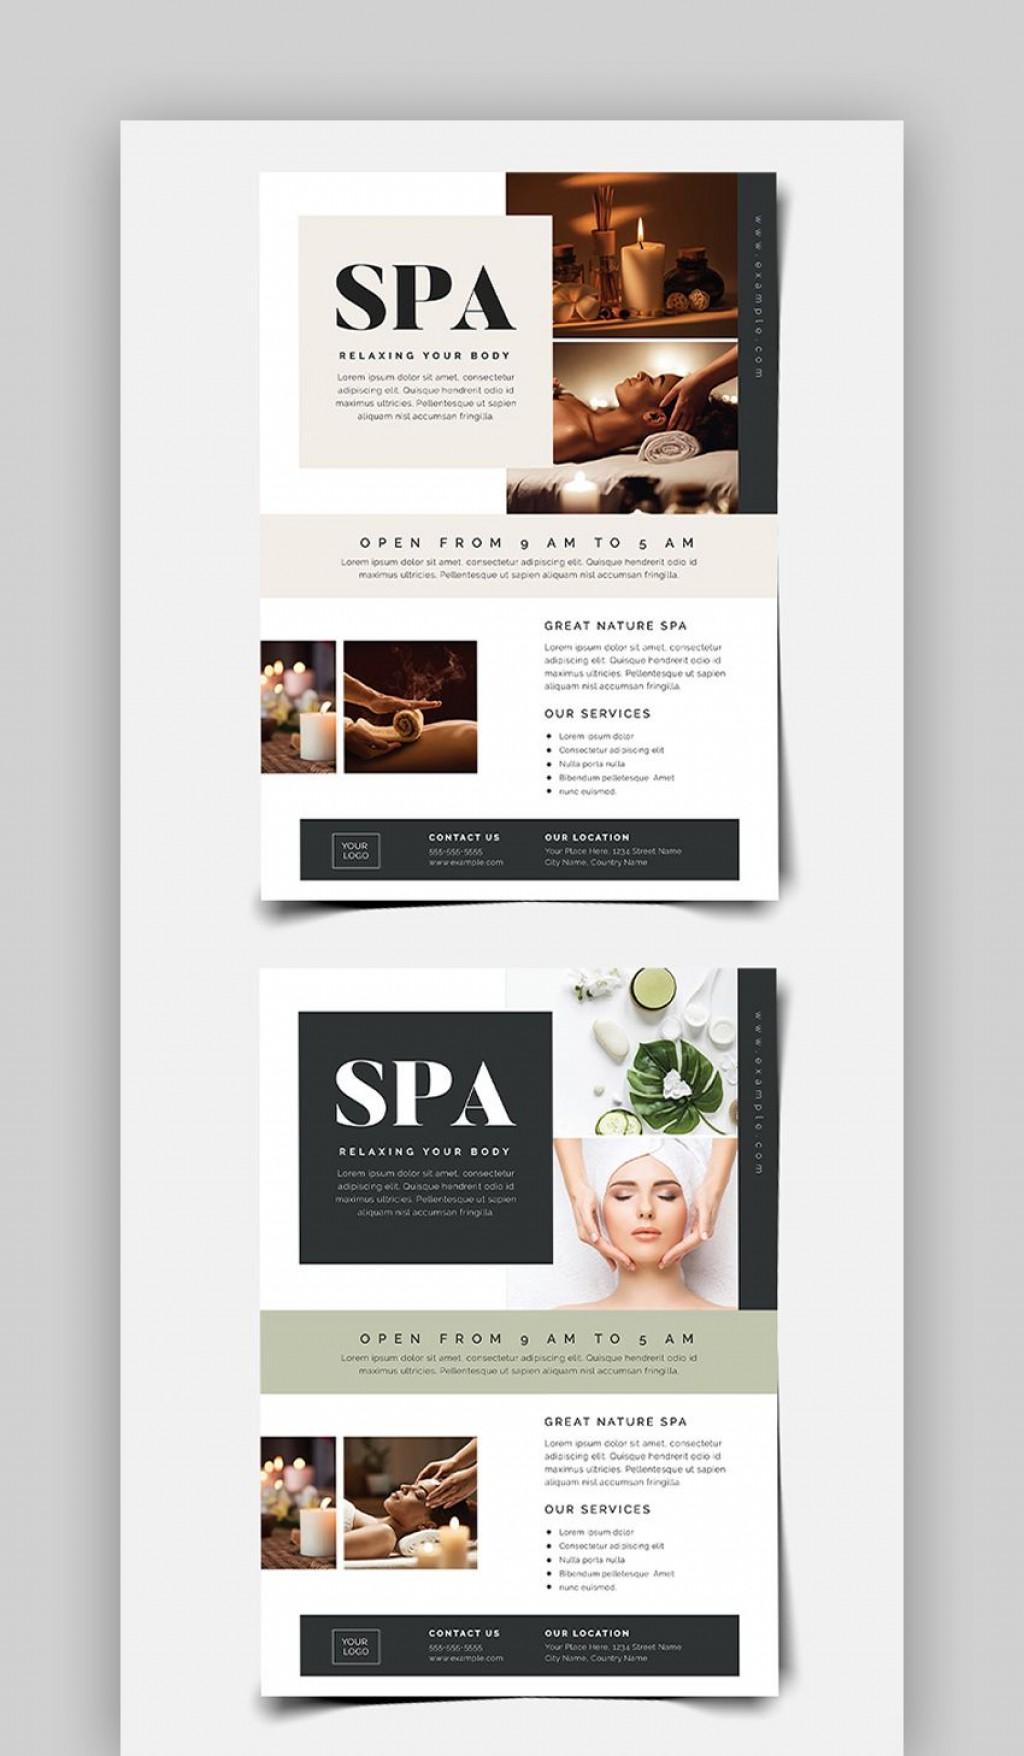 014 Stupendou Free Flyer Design Template Image  Templates Online Download PsdLarge